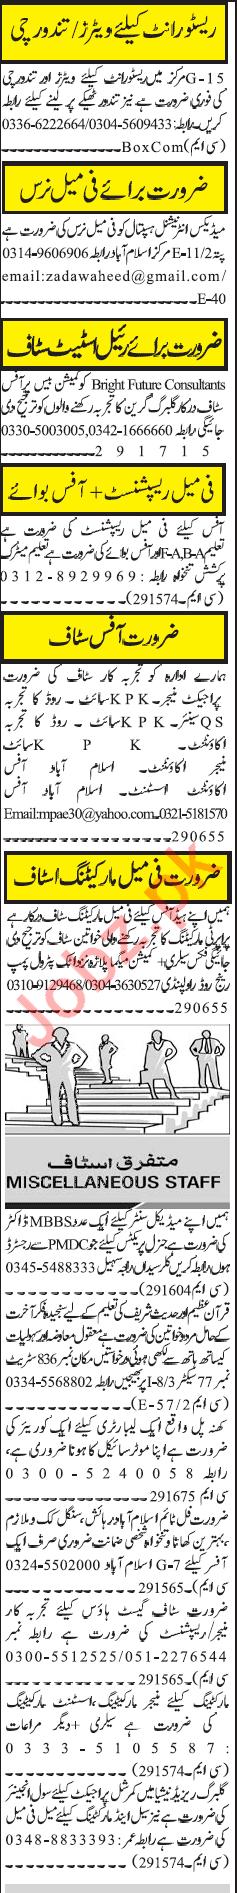 Daily Jang Newspaper Classified Jobs 2019 For Rawalindi